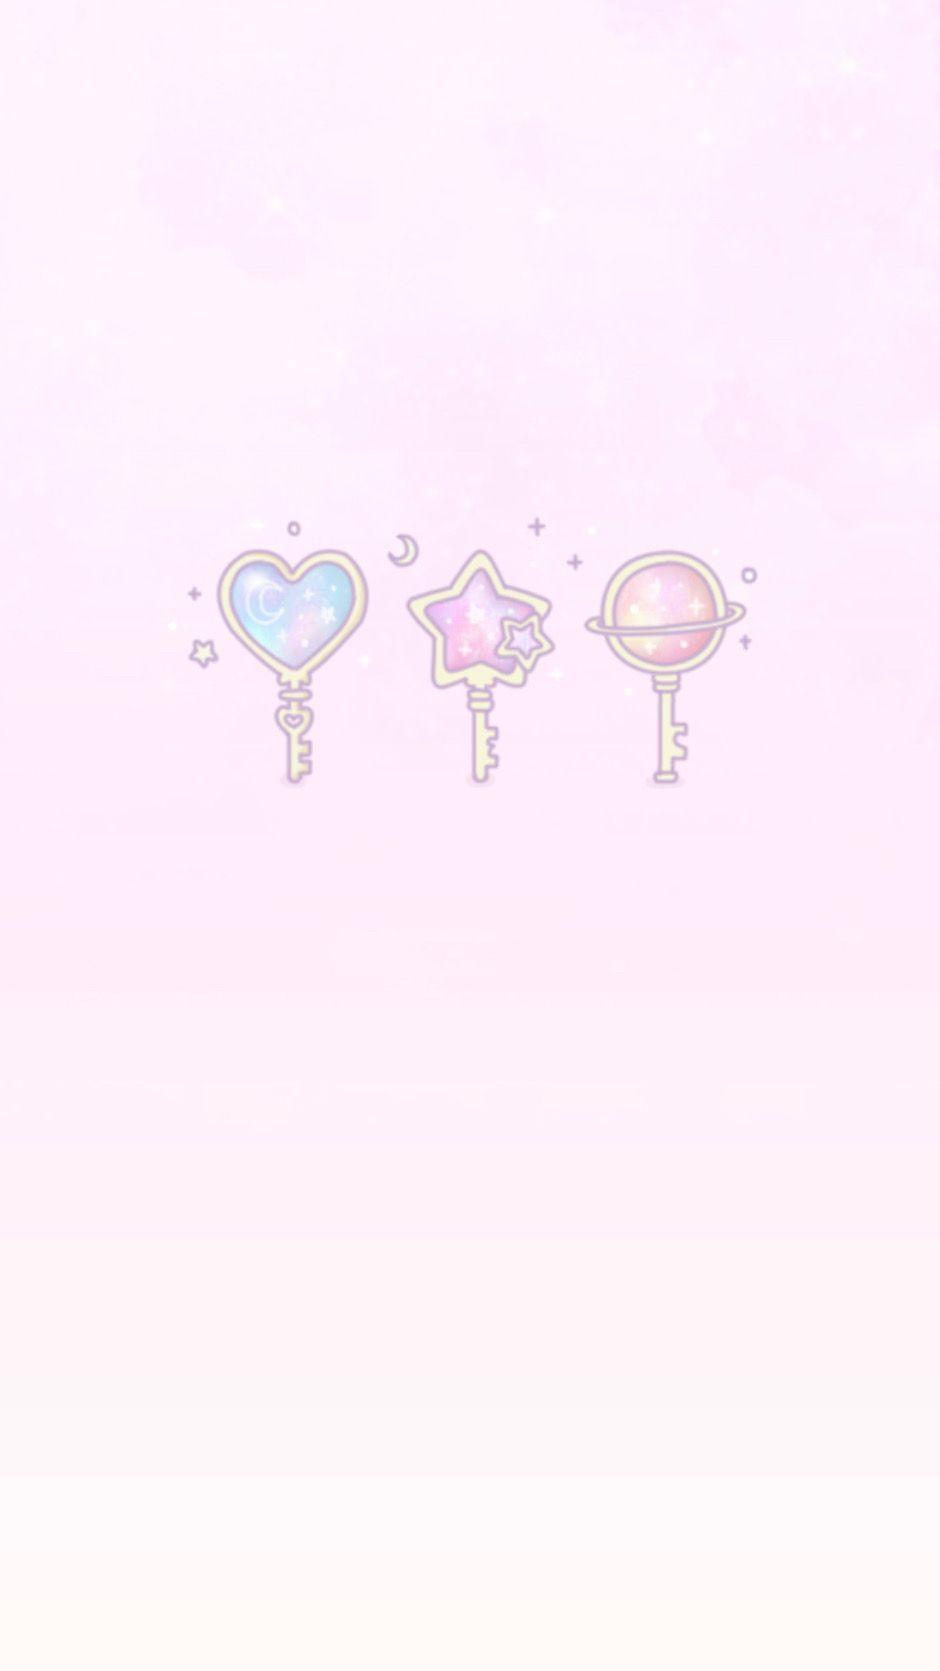 Pin By Nour Alnaqbi On Anime Manga Kawaii Cute Pastel Wallpaper Kawaii Wallpaper Cute Disney Wallpaper